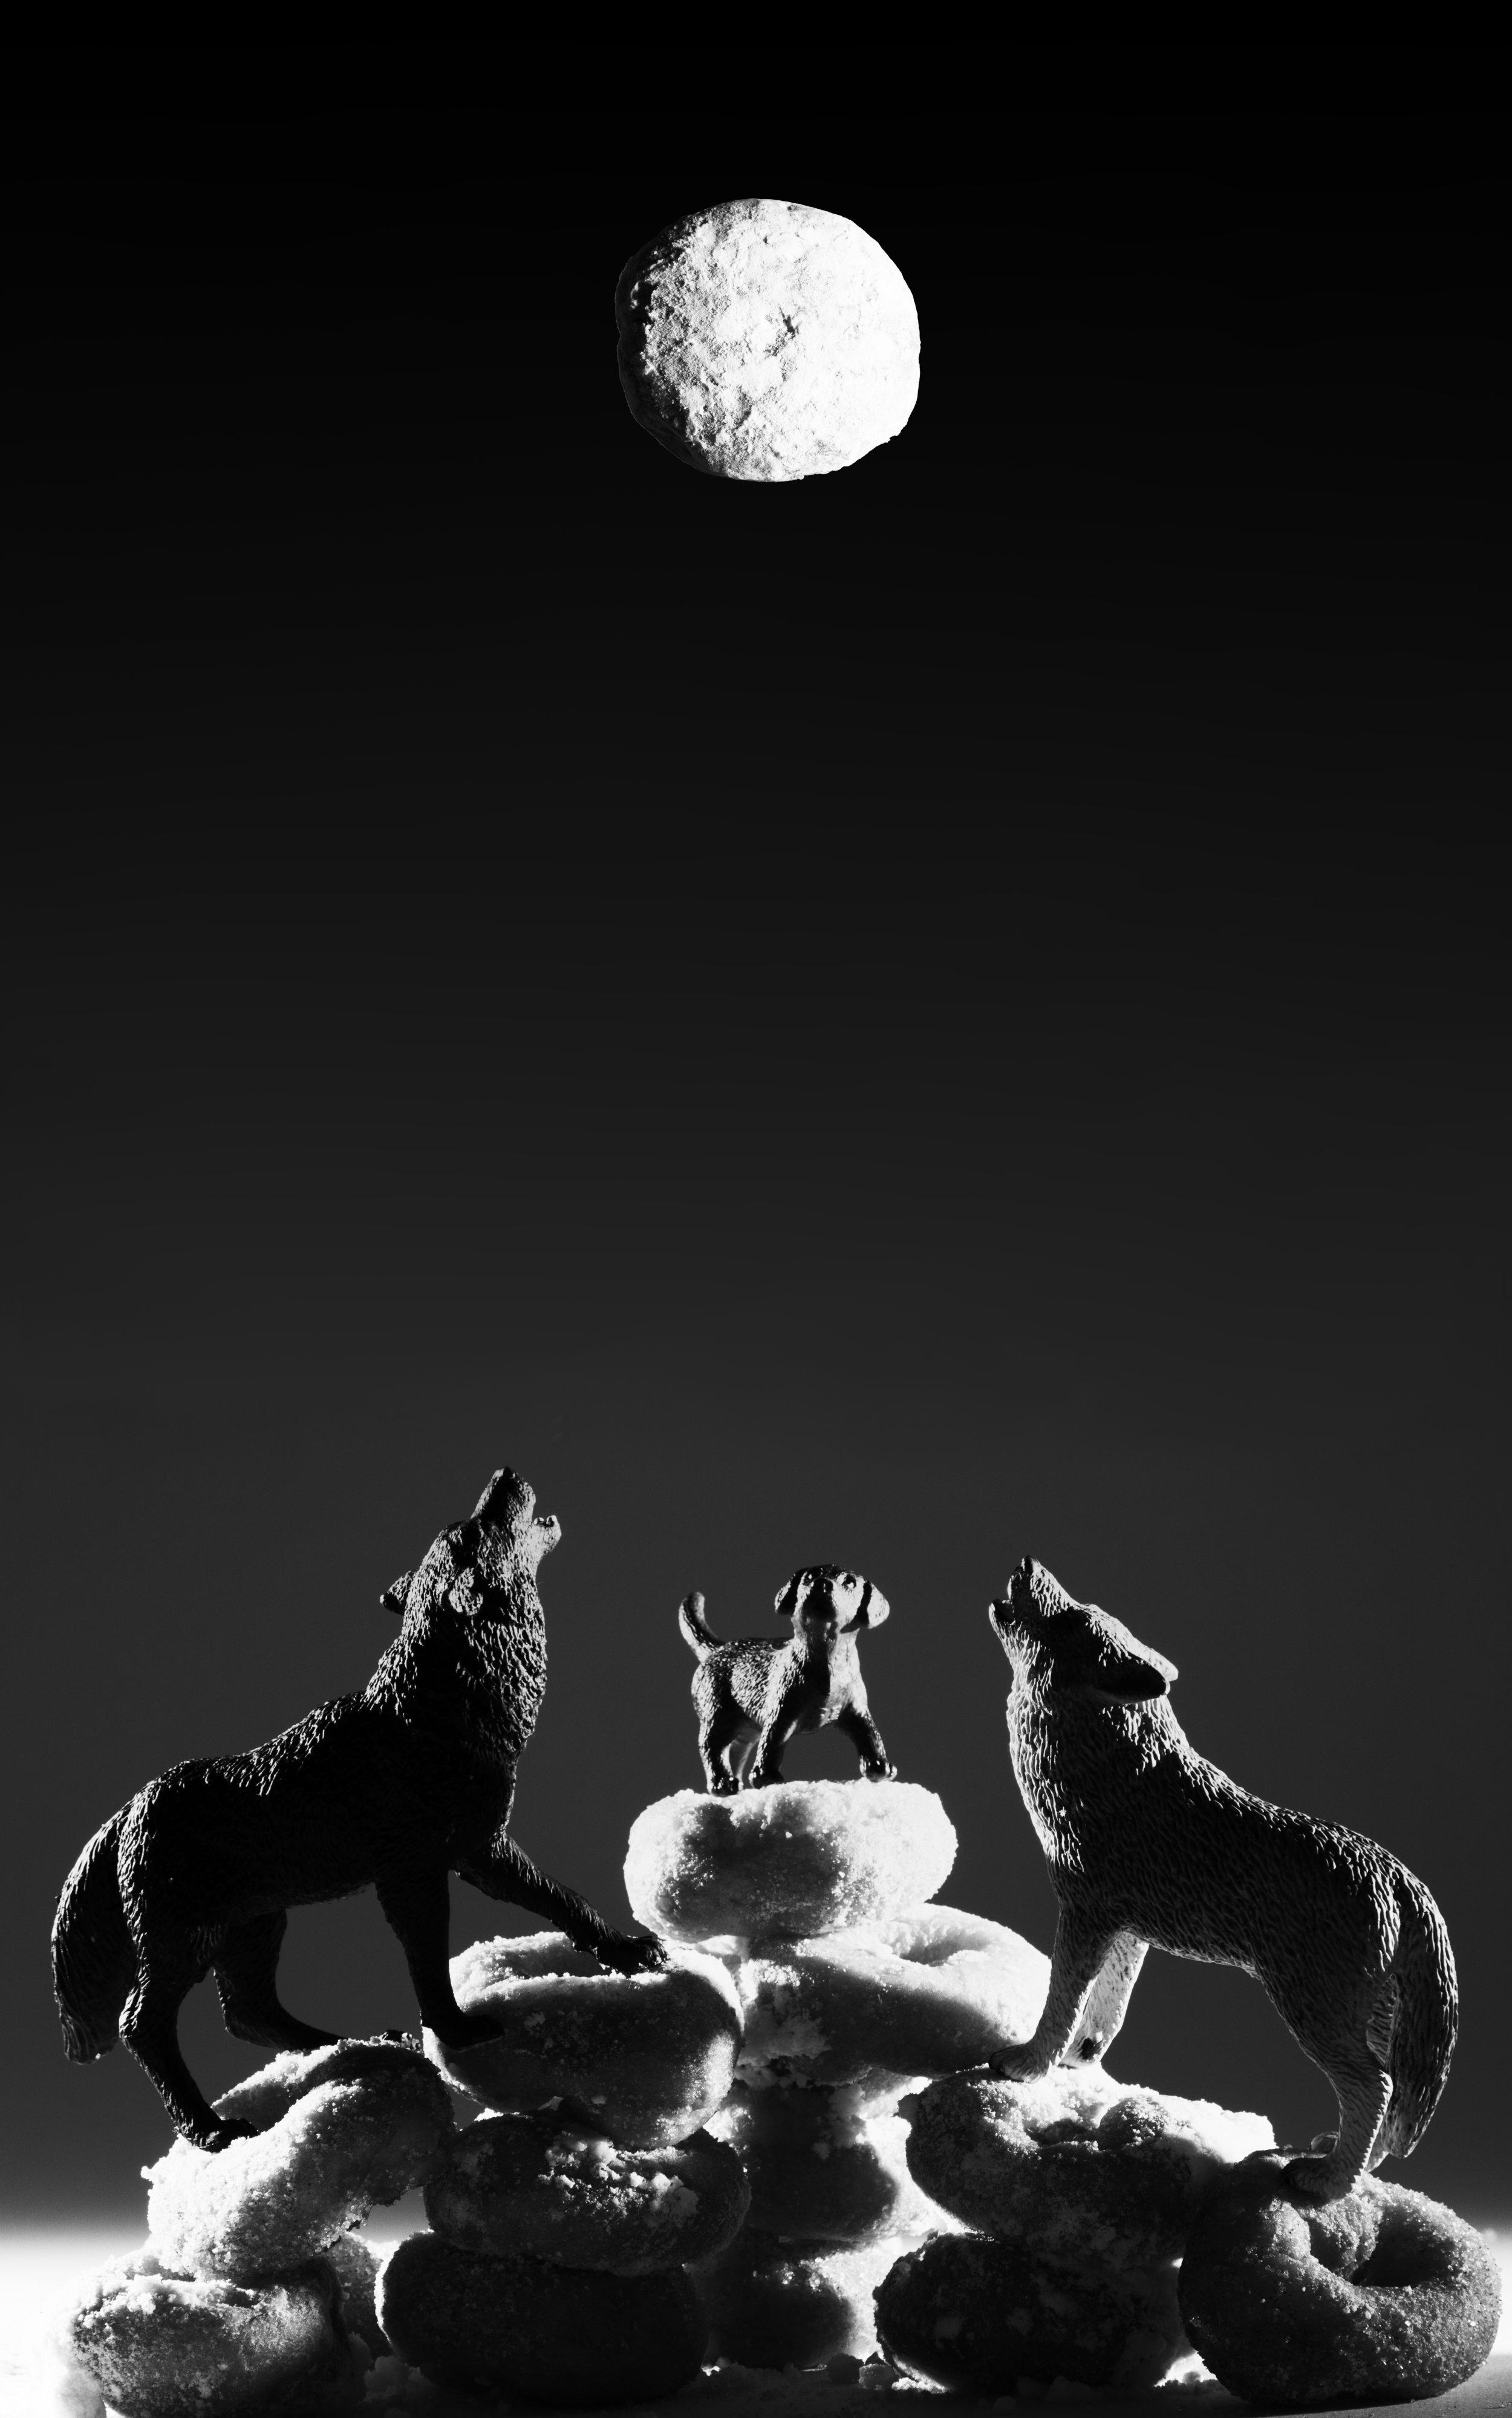 Wolves, Puppy, Full Moon Donut